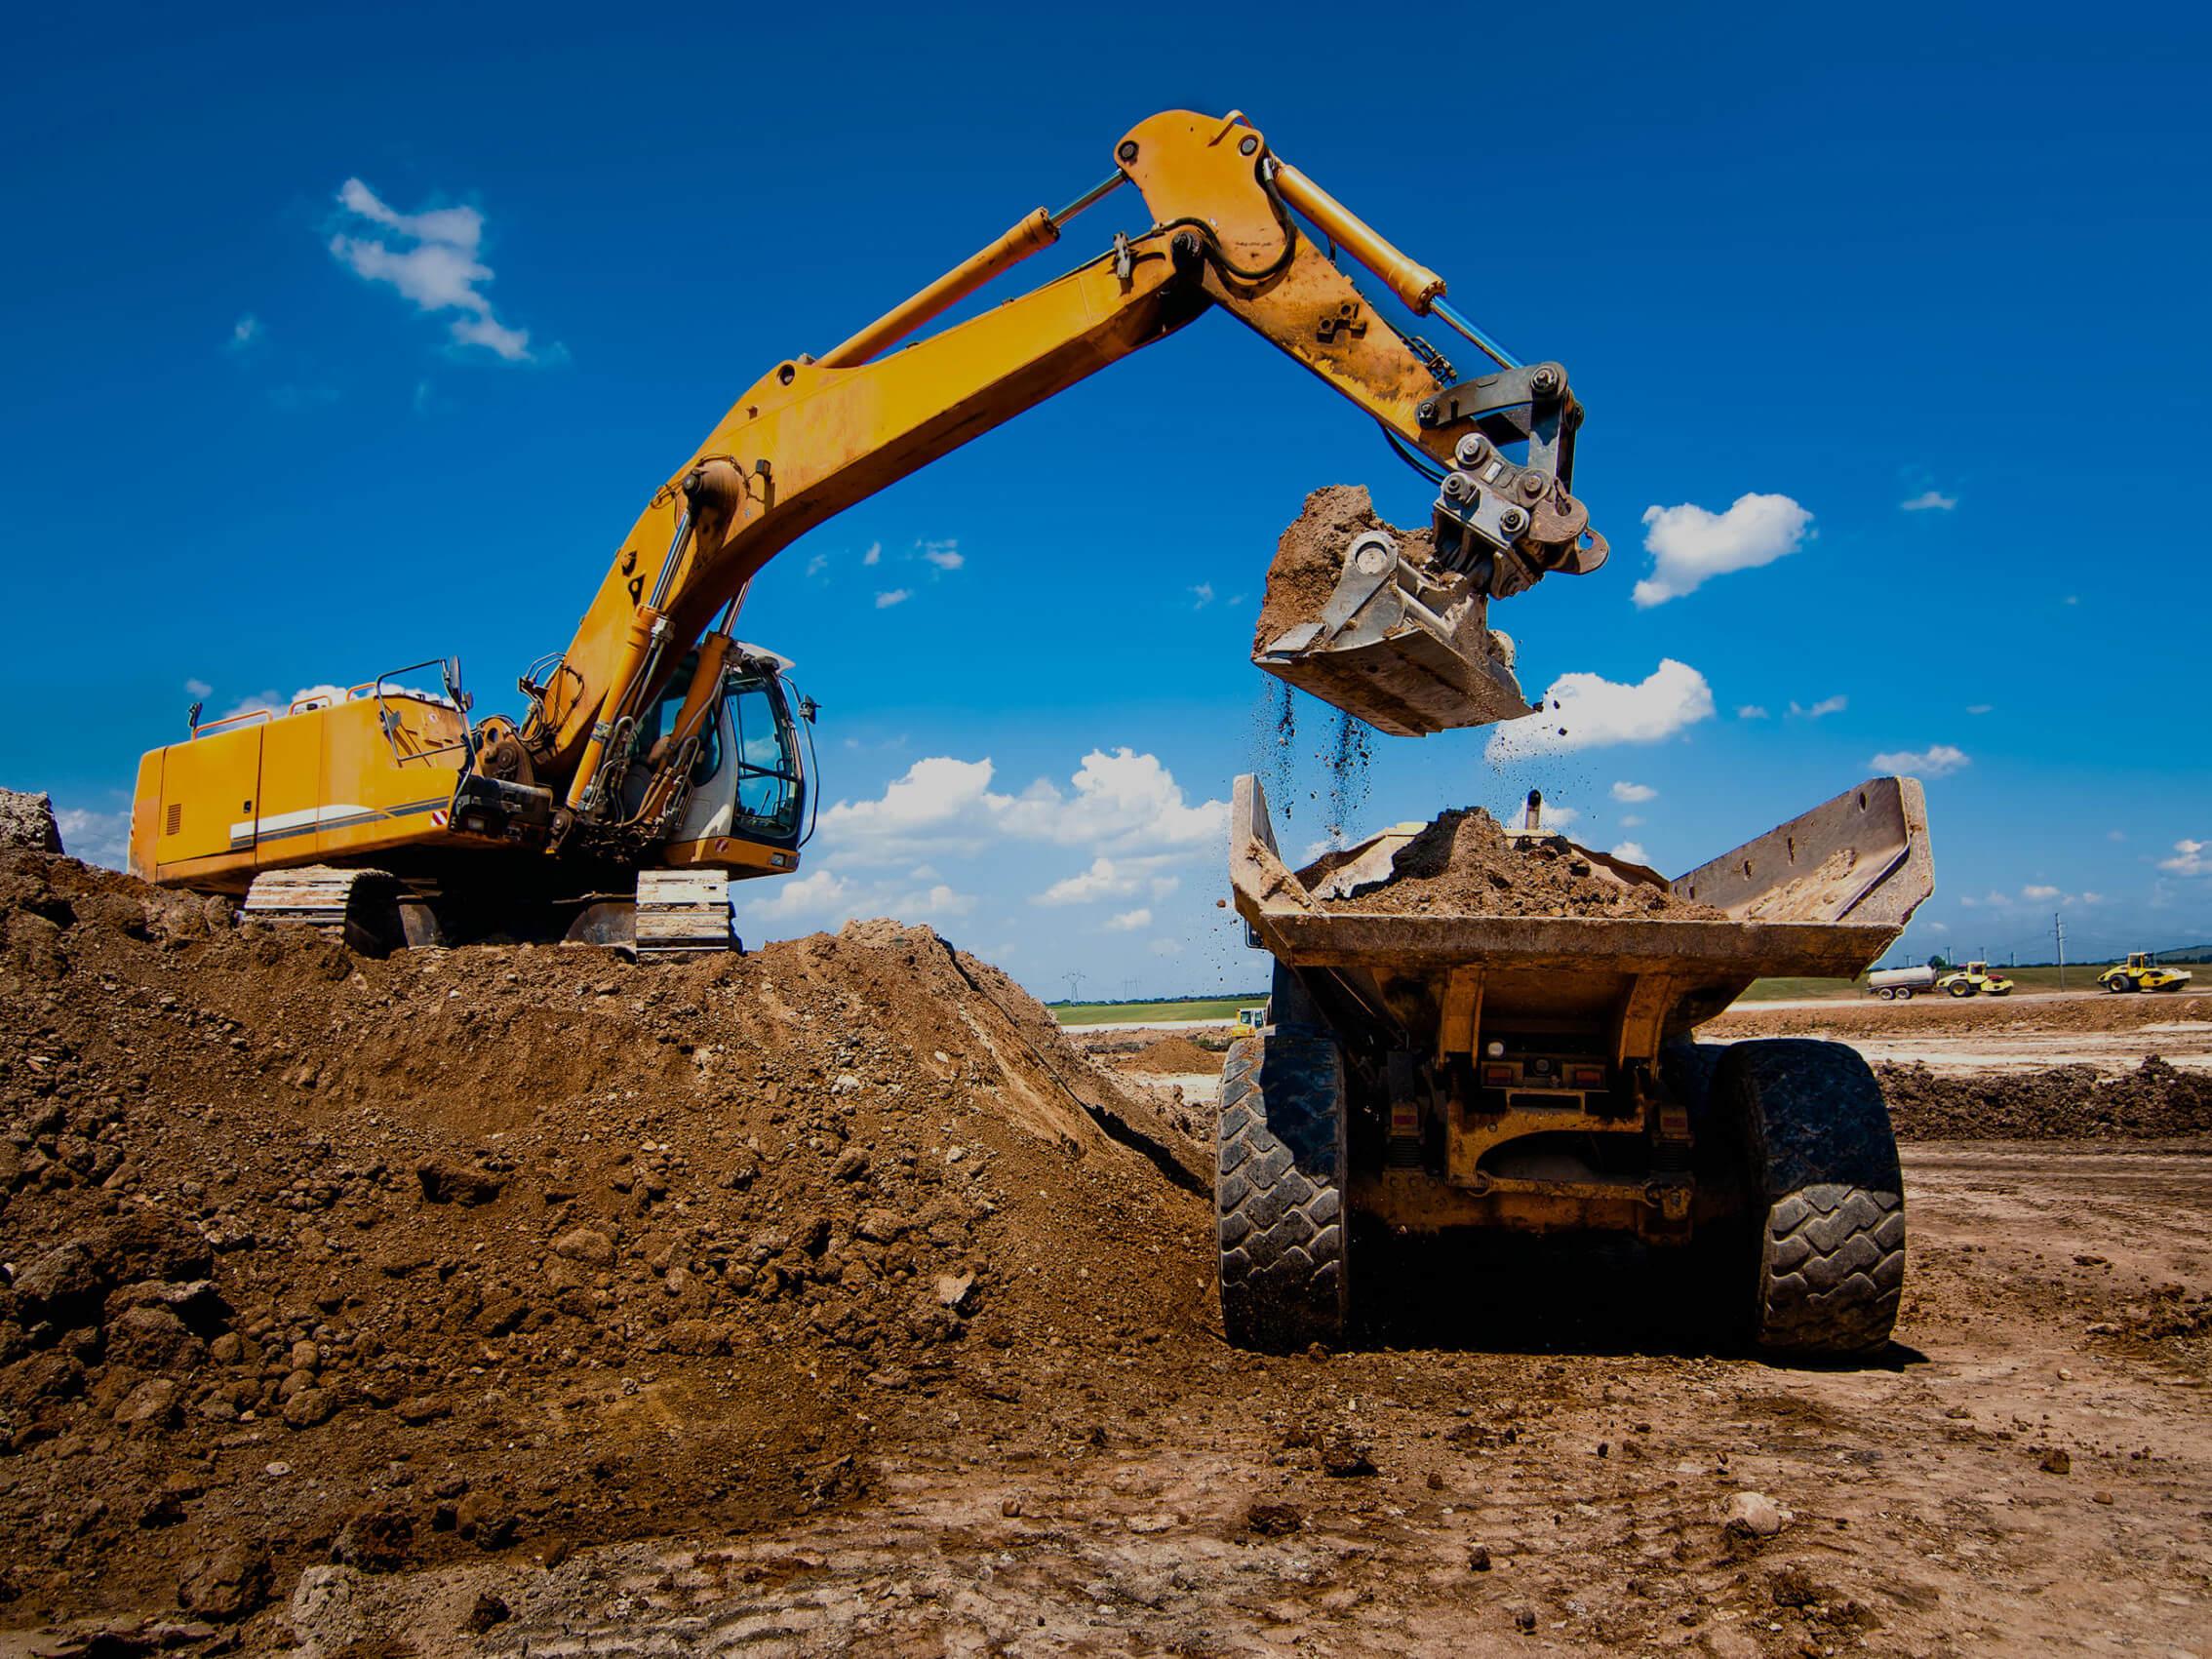 Excavator & Dump Truck